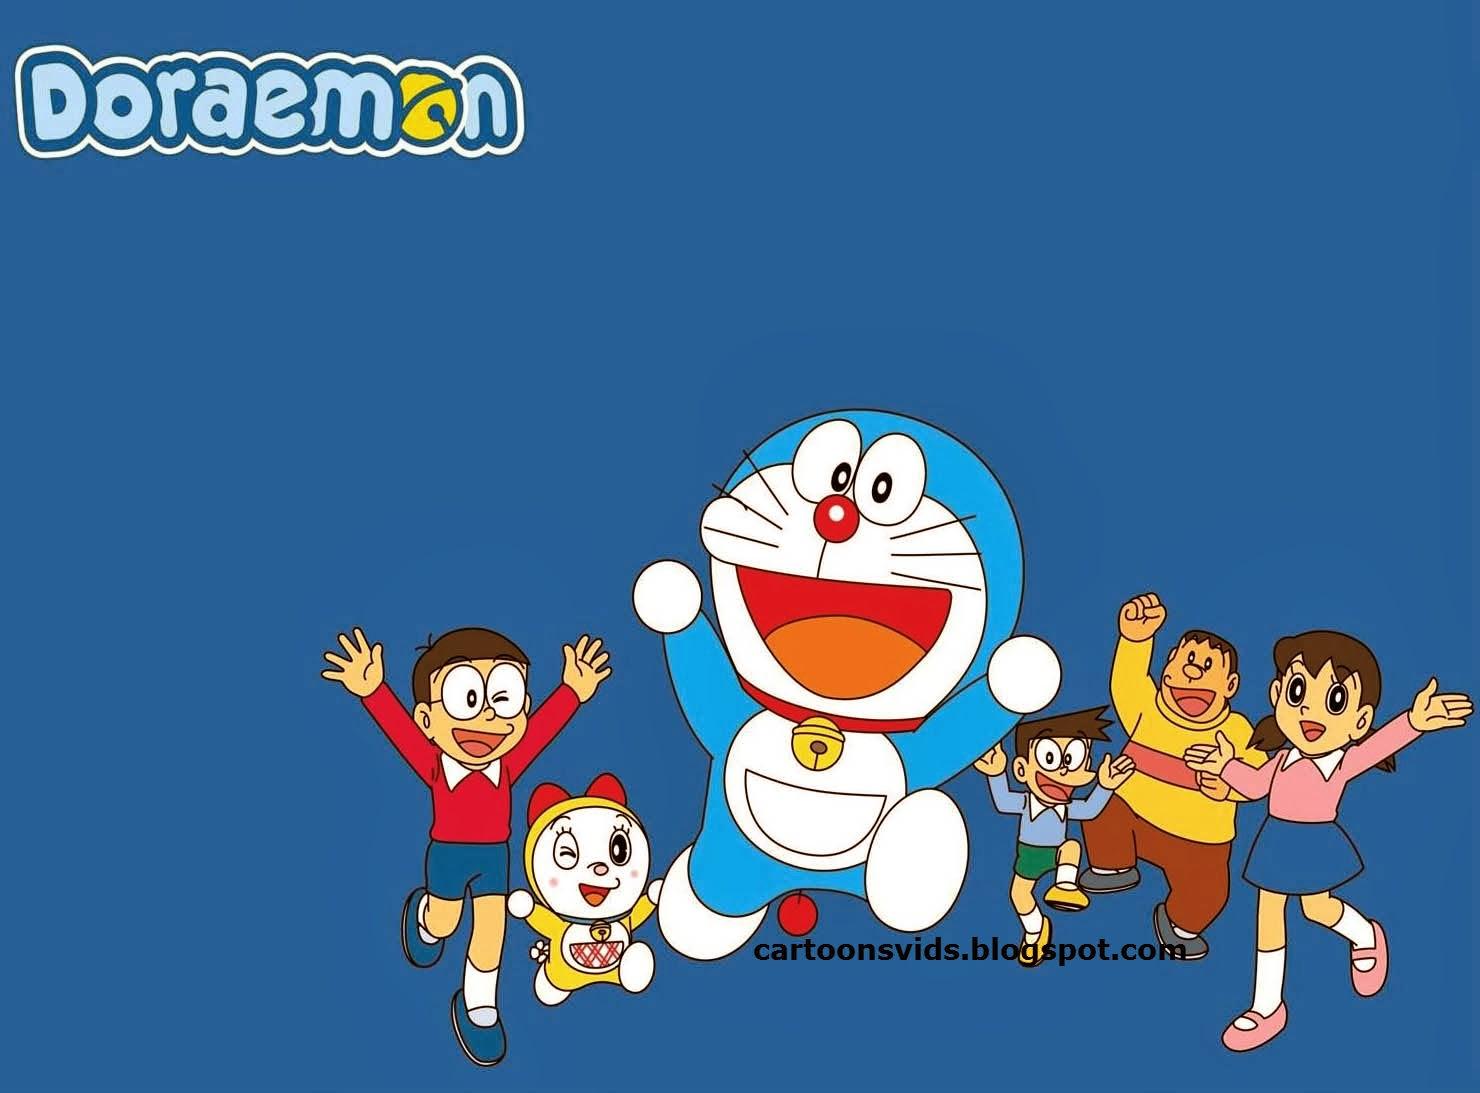 Free Download Cartoons Videos Doraemon Cartoon In Hindi Latest Full